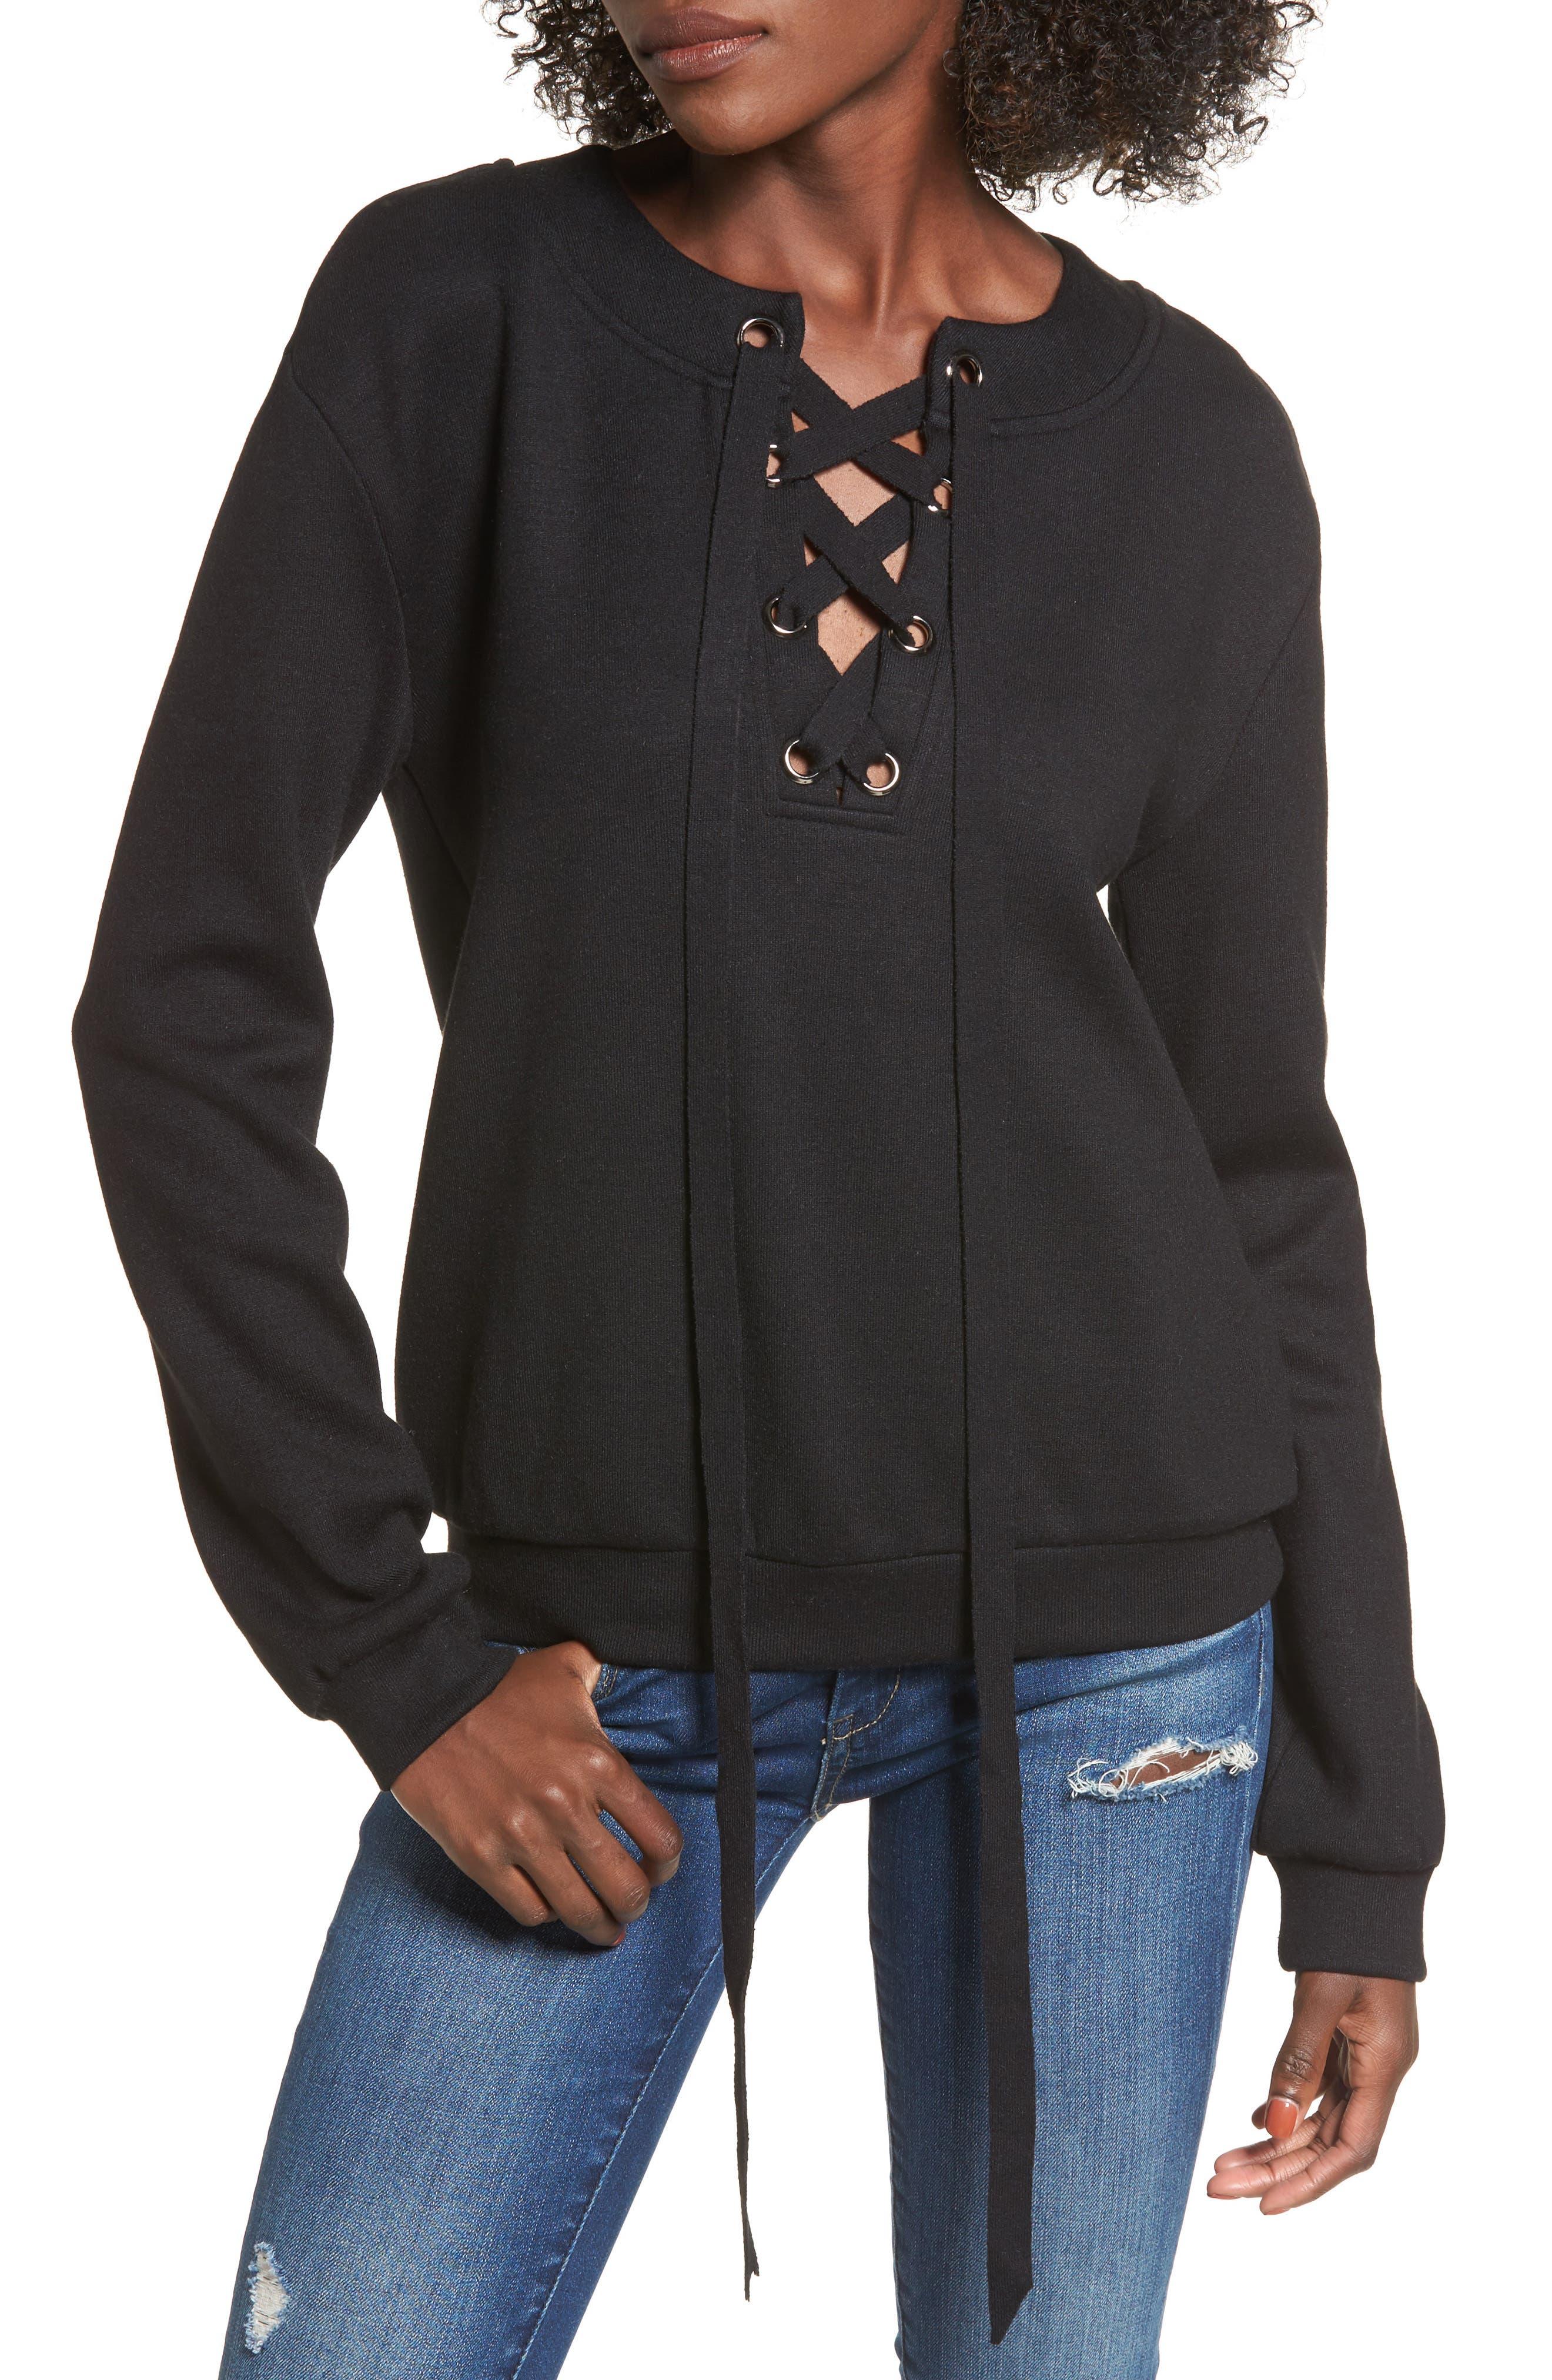 Main Image - J.O.A. Lace-Up Sweatshirt